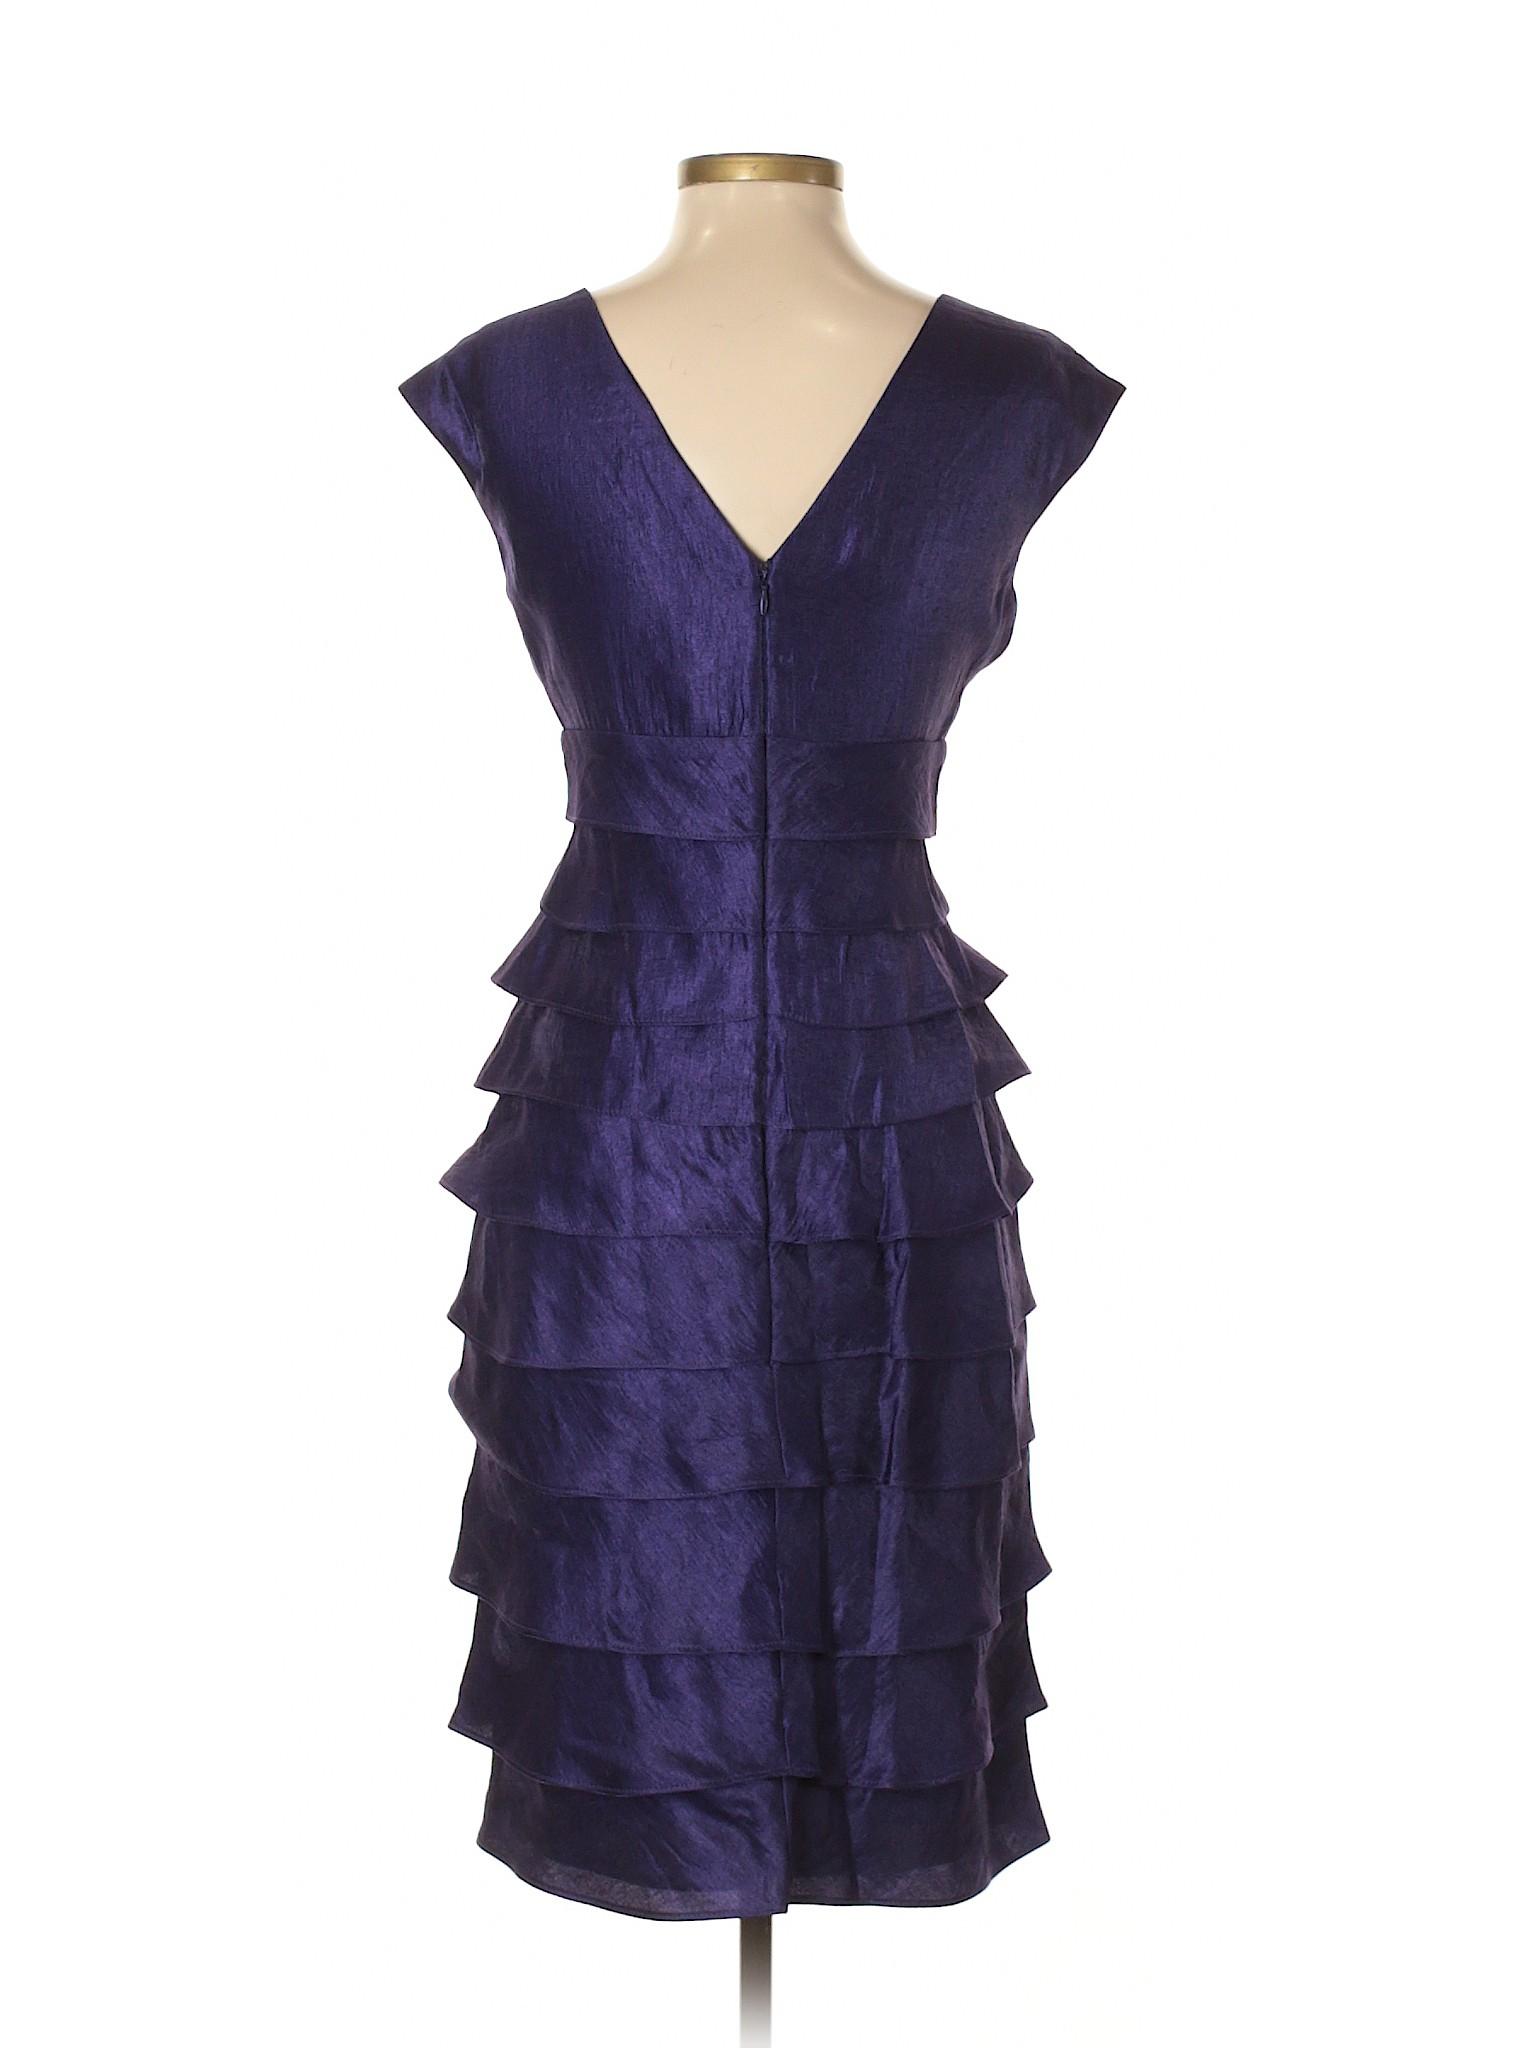 Selling DressBarn Dress Selling DressBarn Cocktail U144X